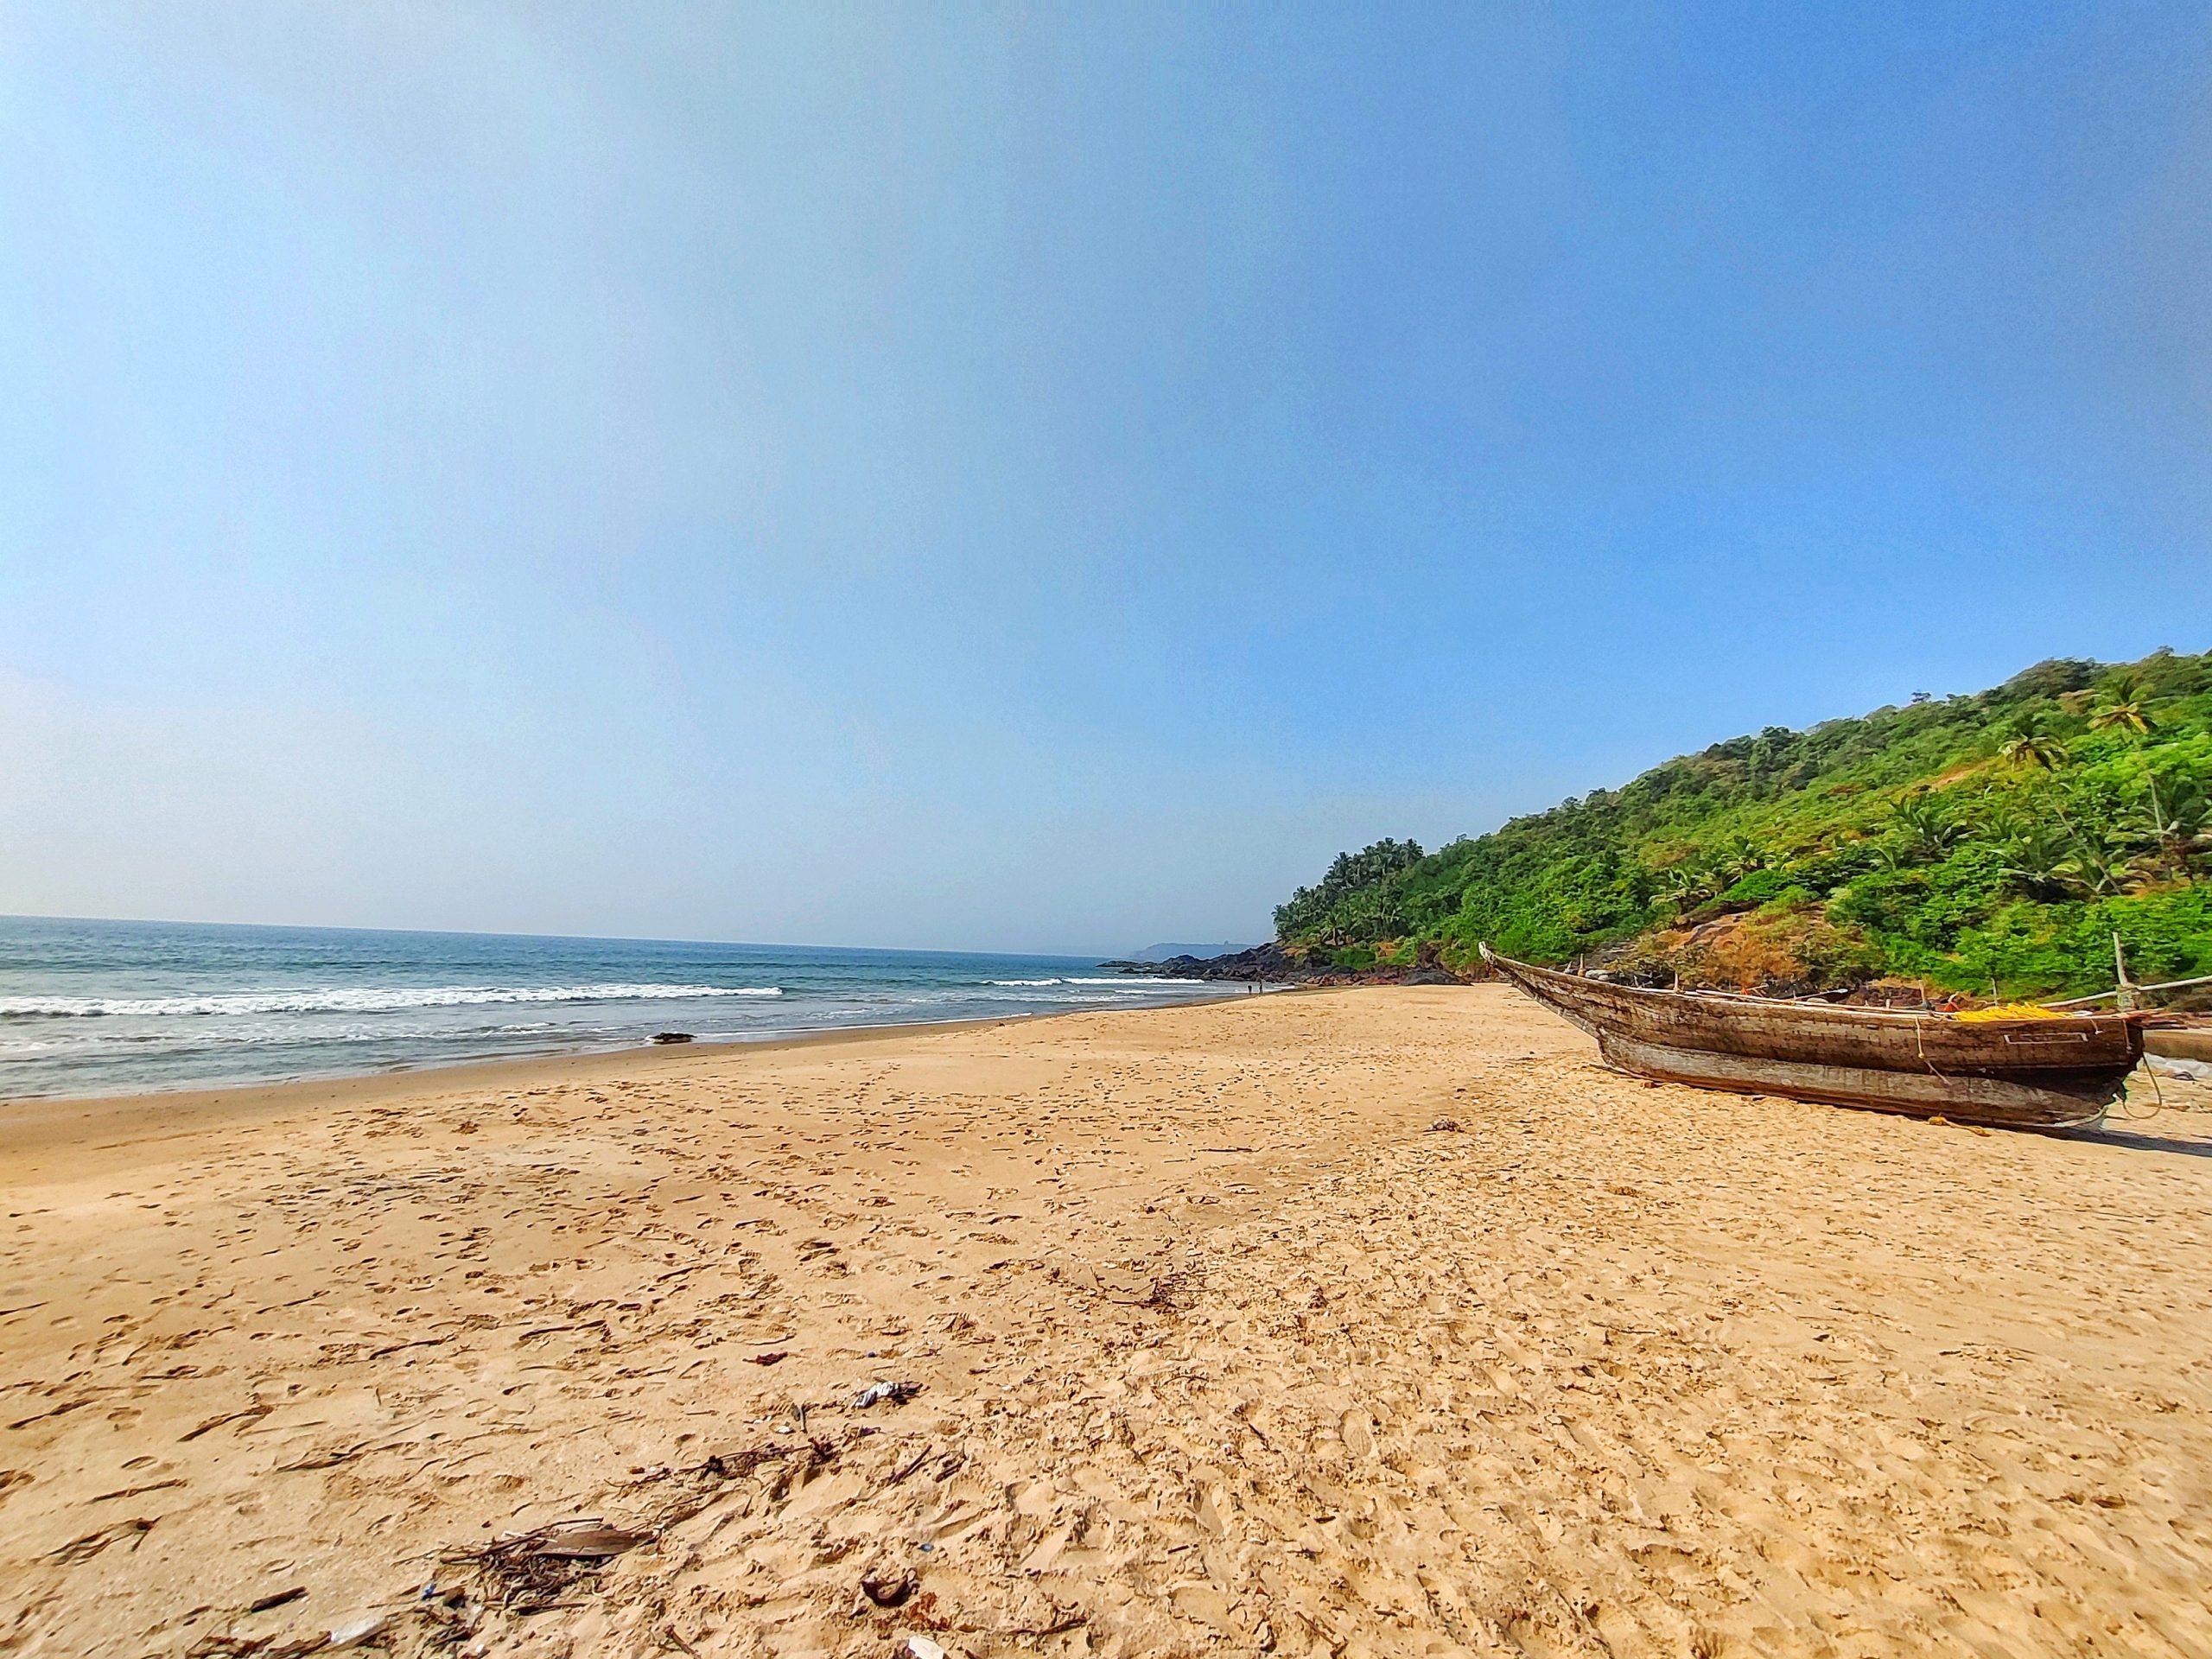 Kondura beach in Vengurla